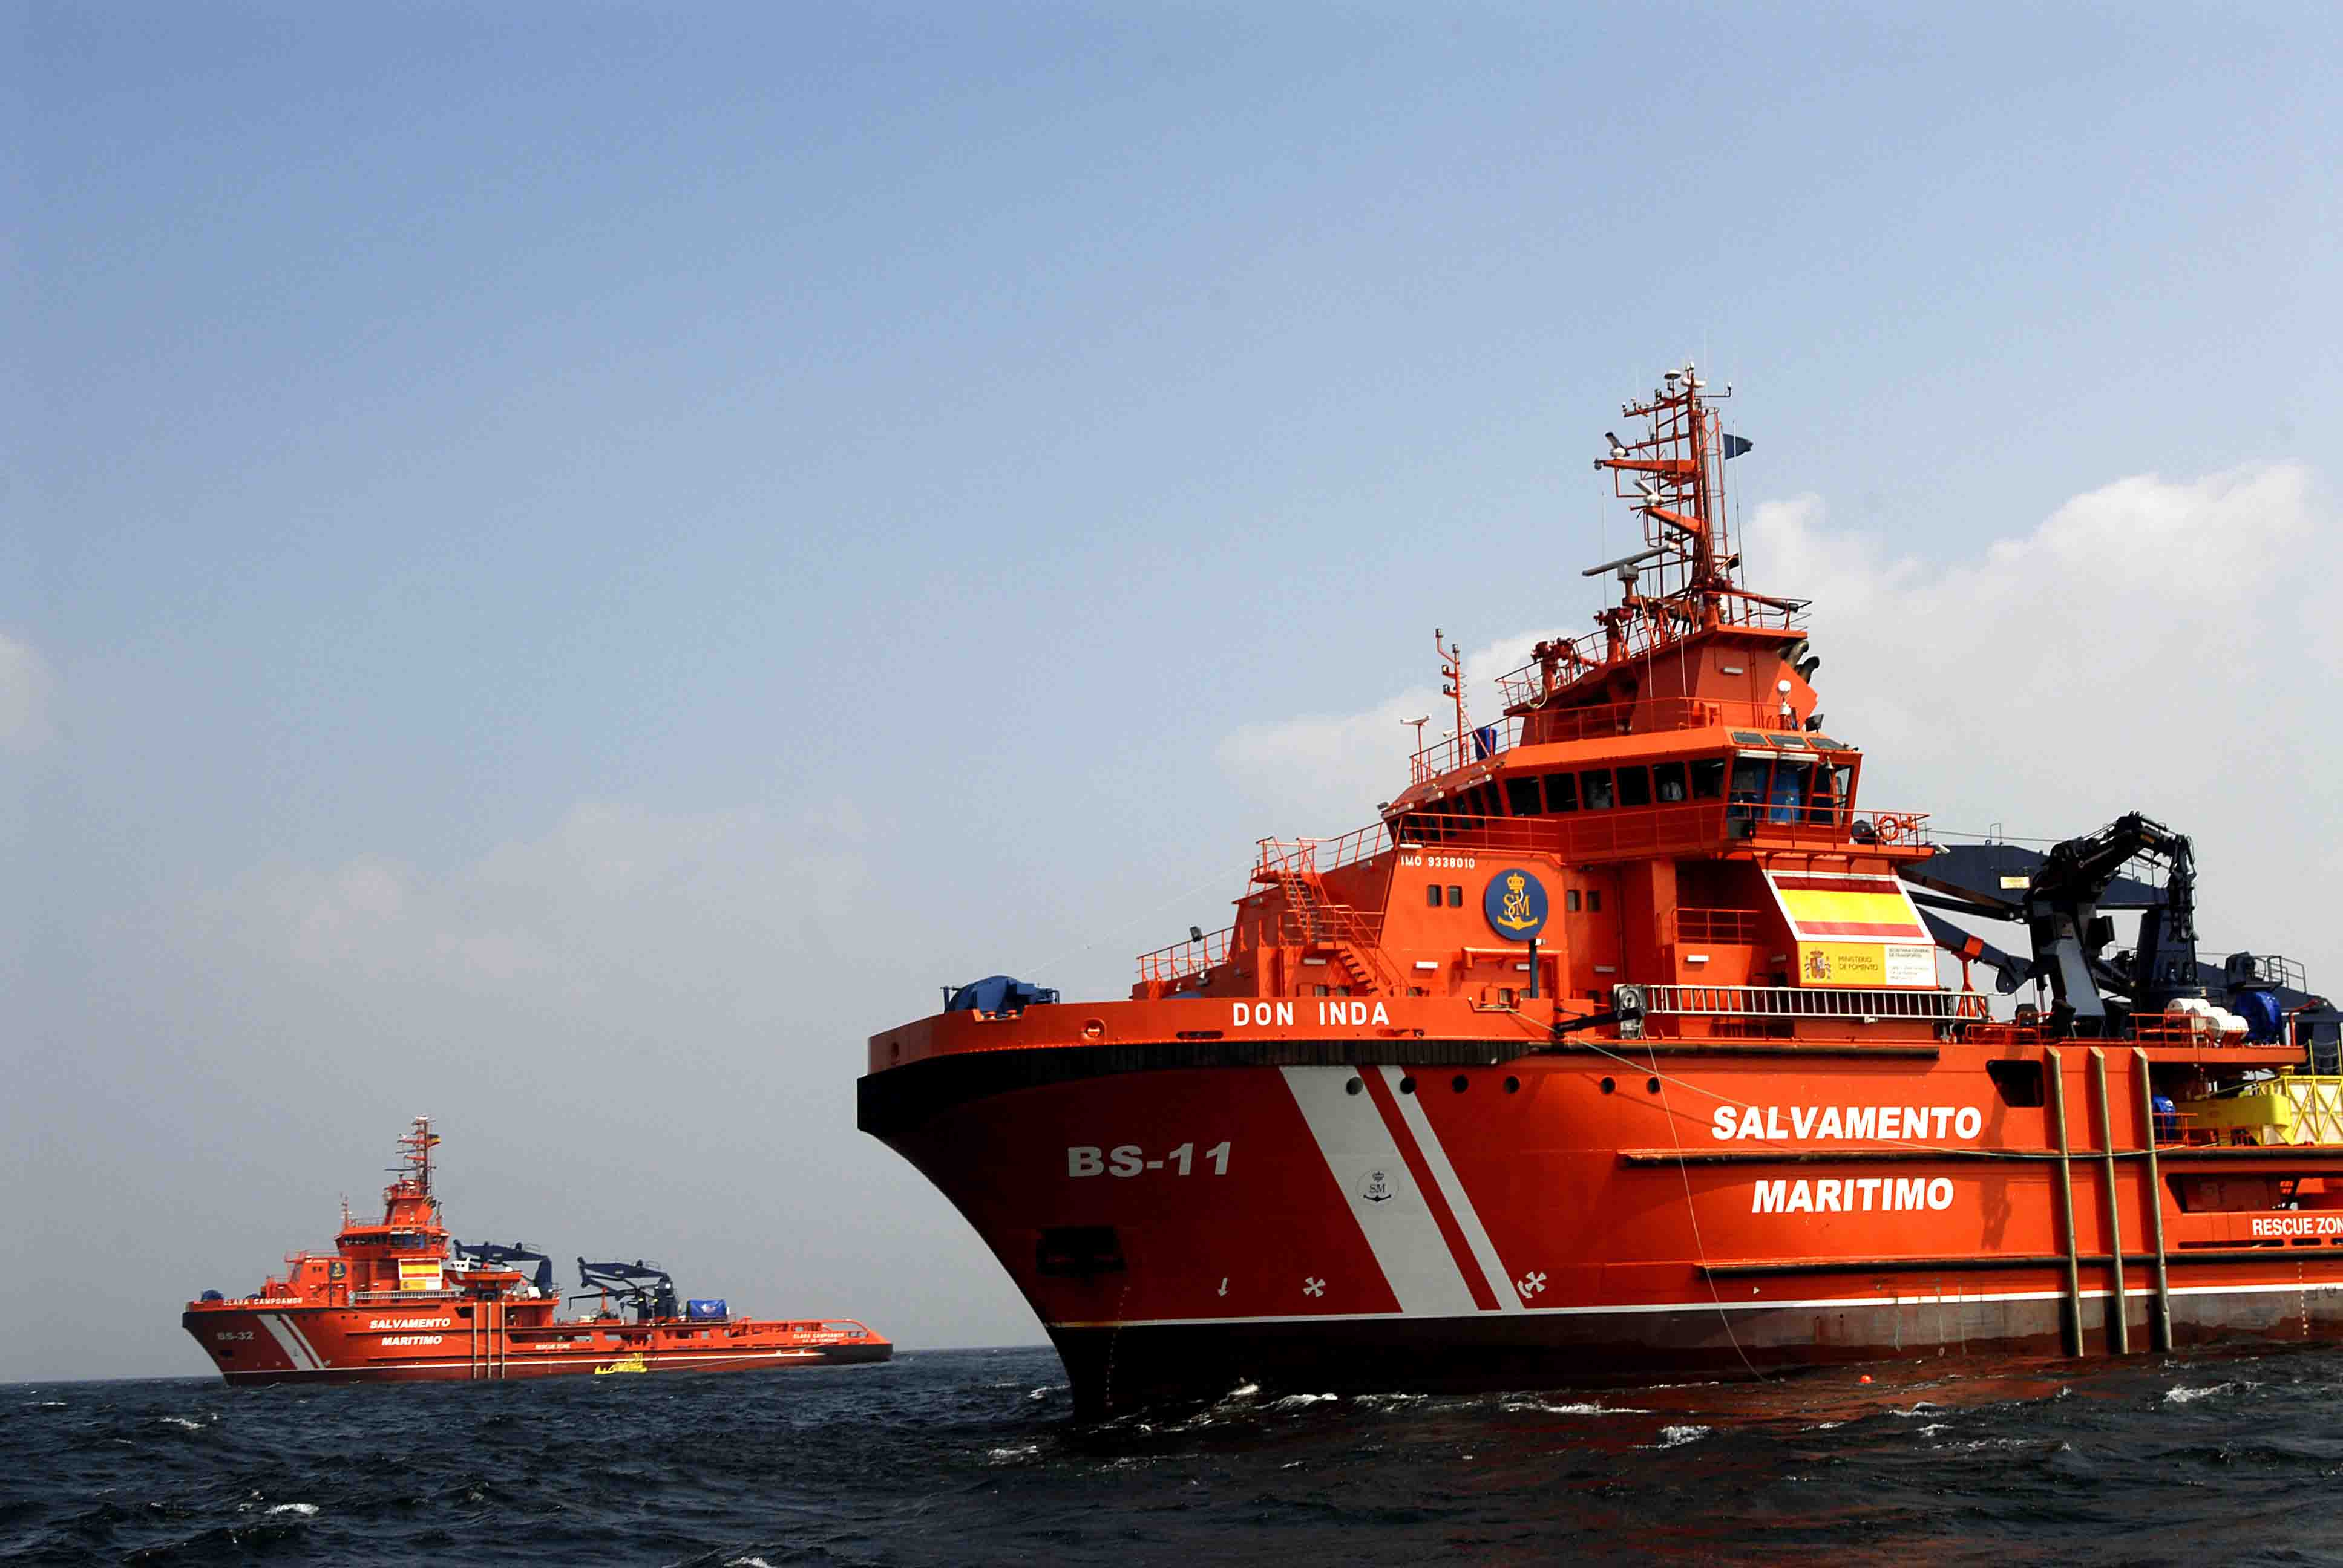 Buques-salvamento marítimo dos